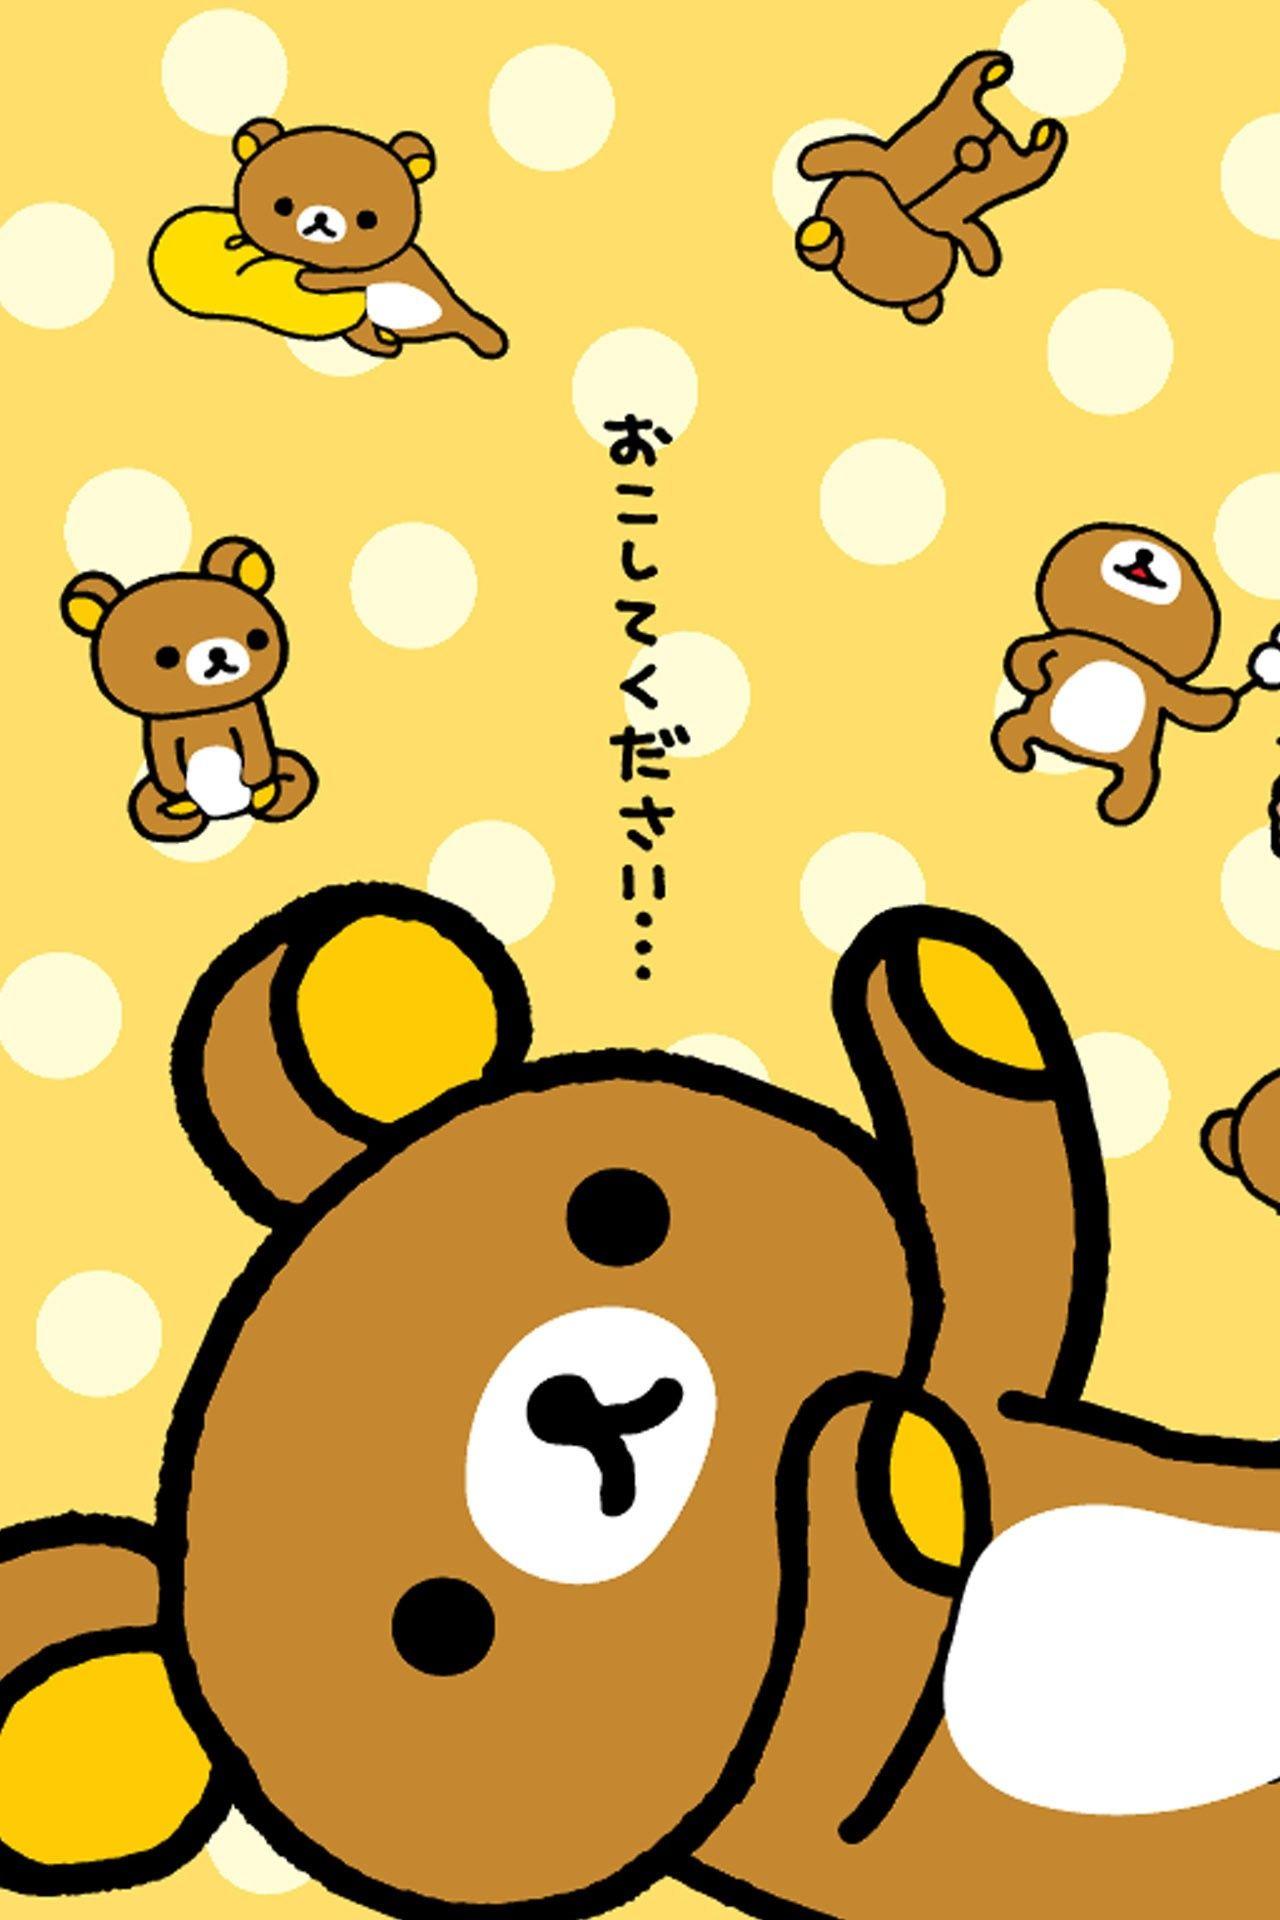 Cool Rilakkuma Wallpaper 1280x1920 For Iphone 6 Rilakkuma Wallpaper Cute Wallpapers Kawaii Wallpaper